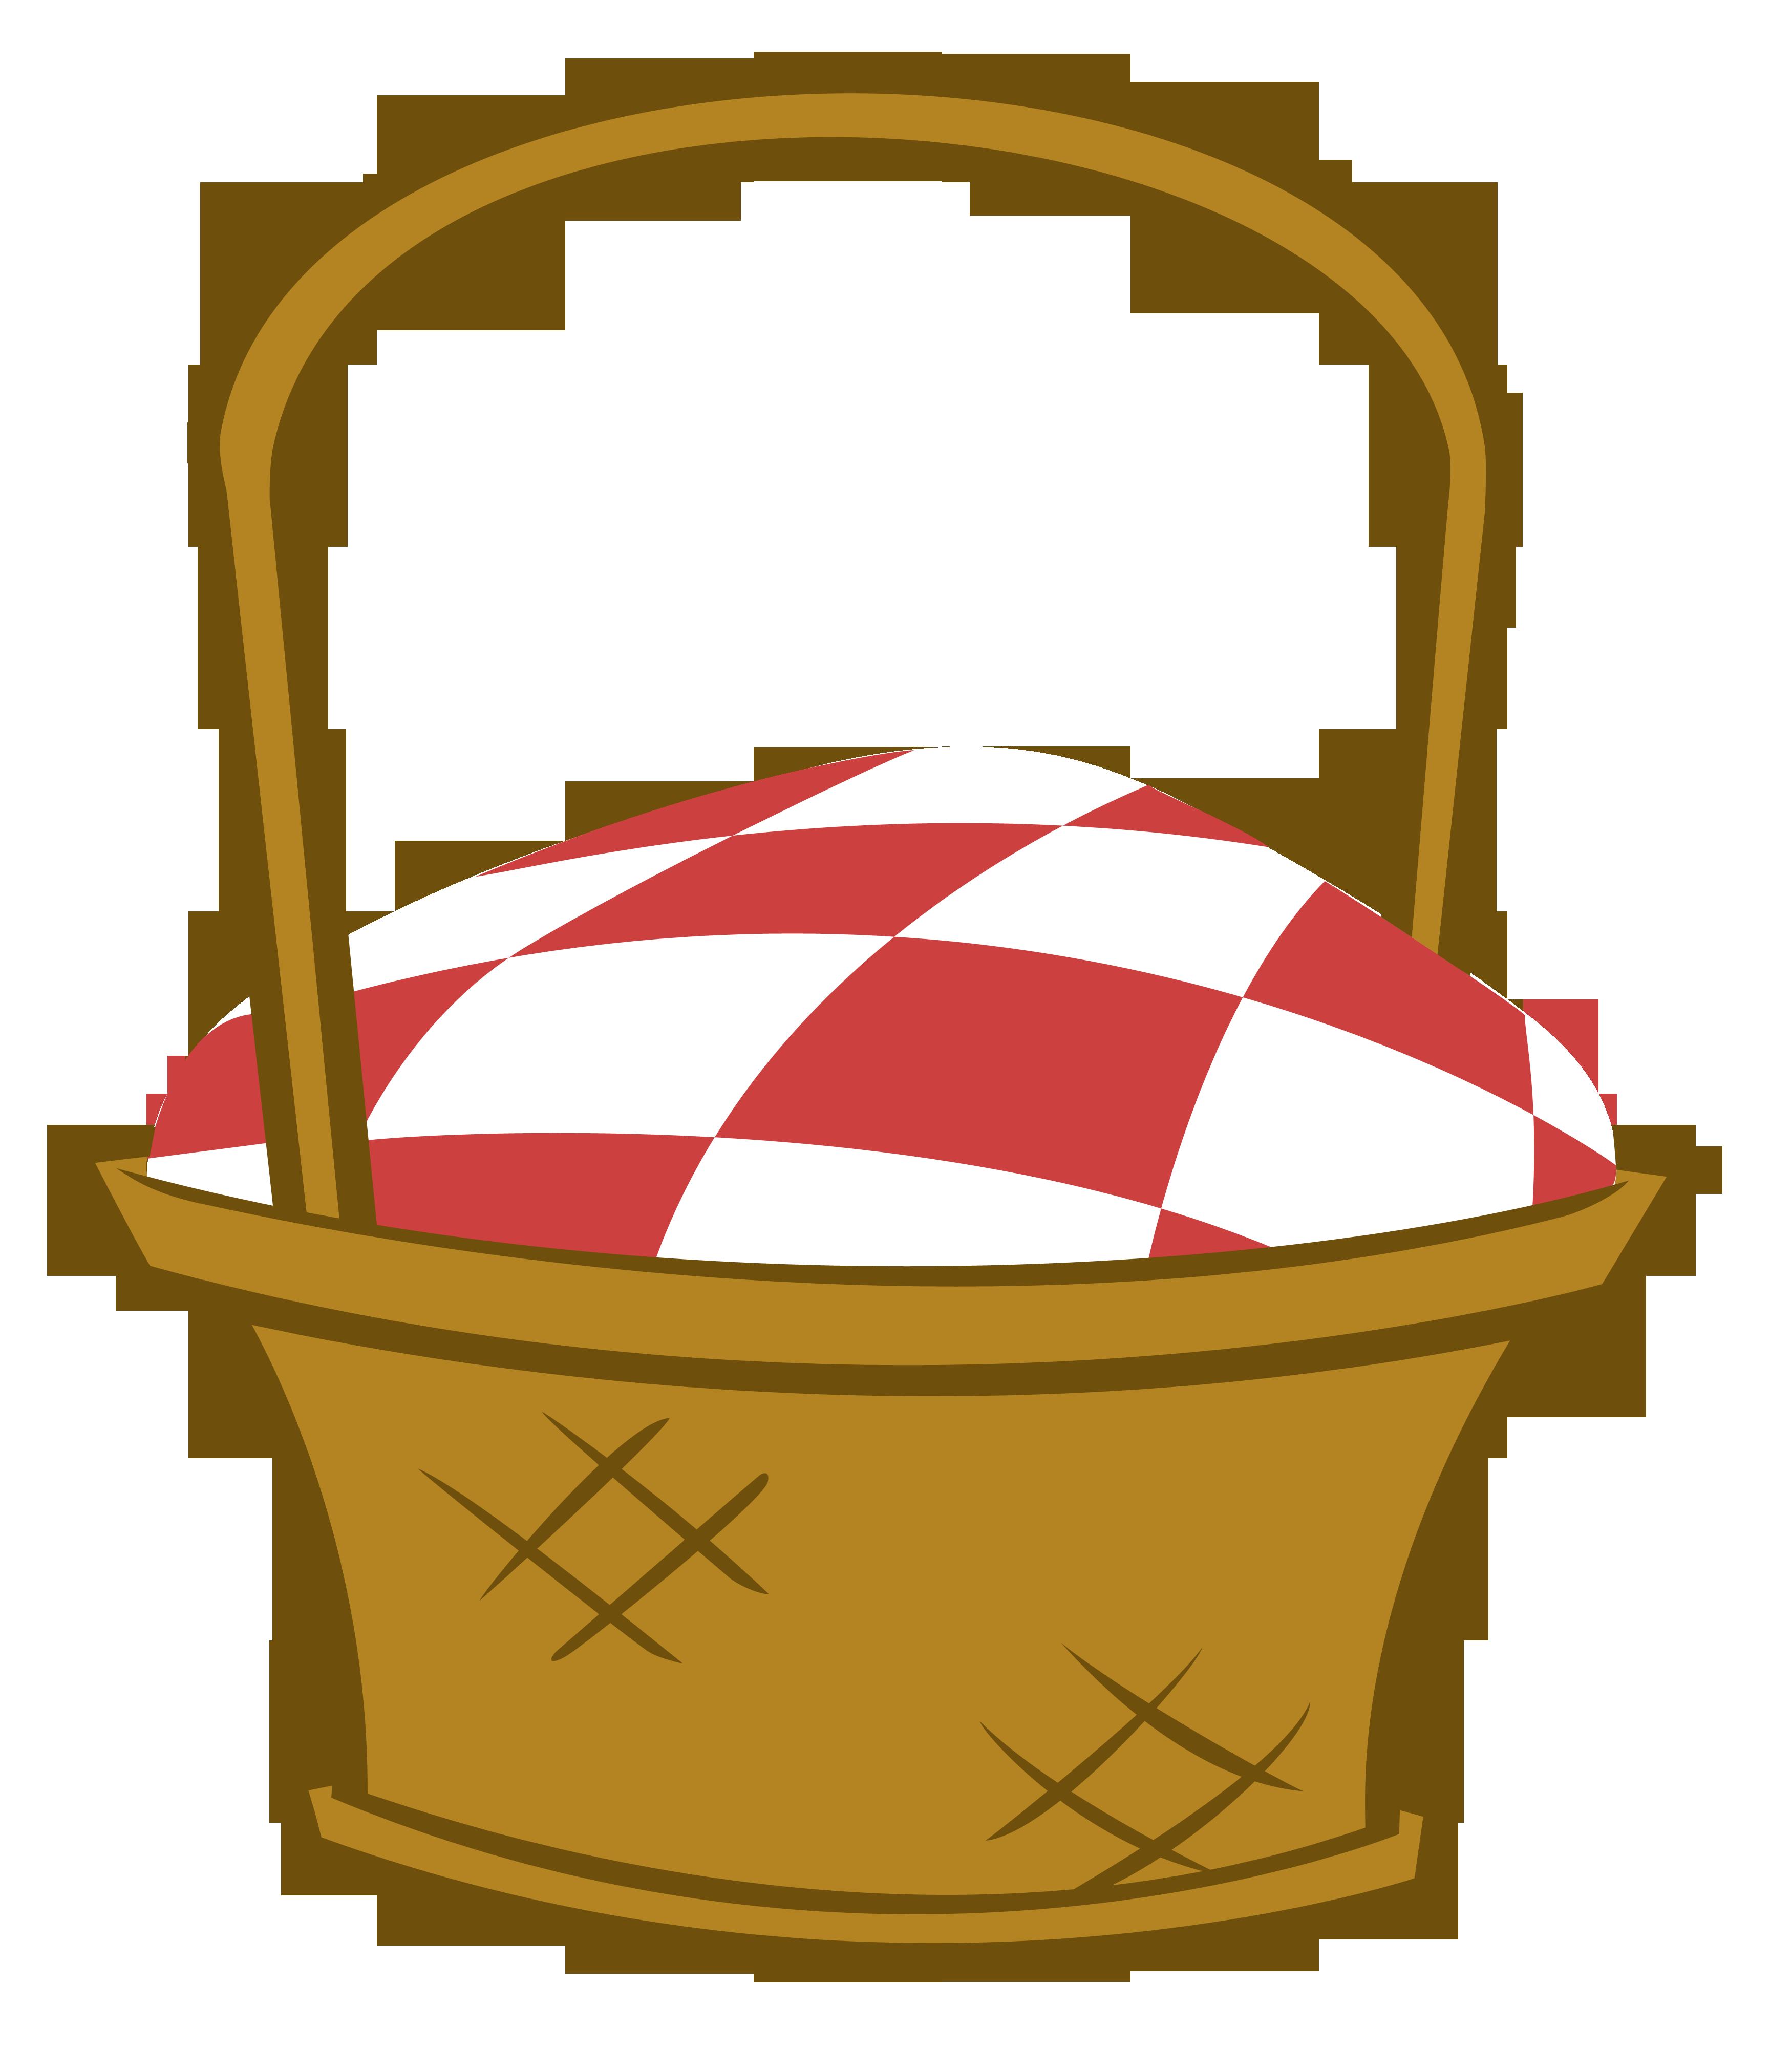 Picnic basket clip art tumundografico 2